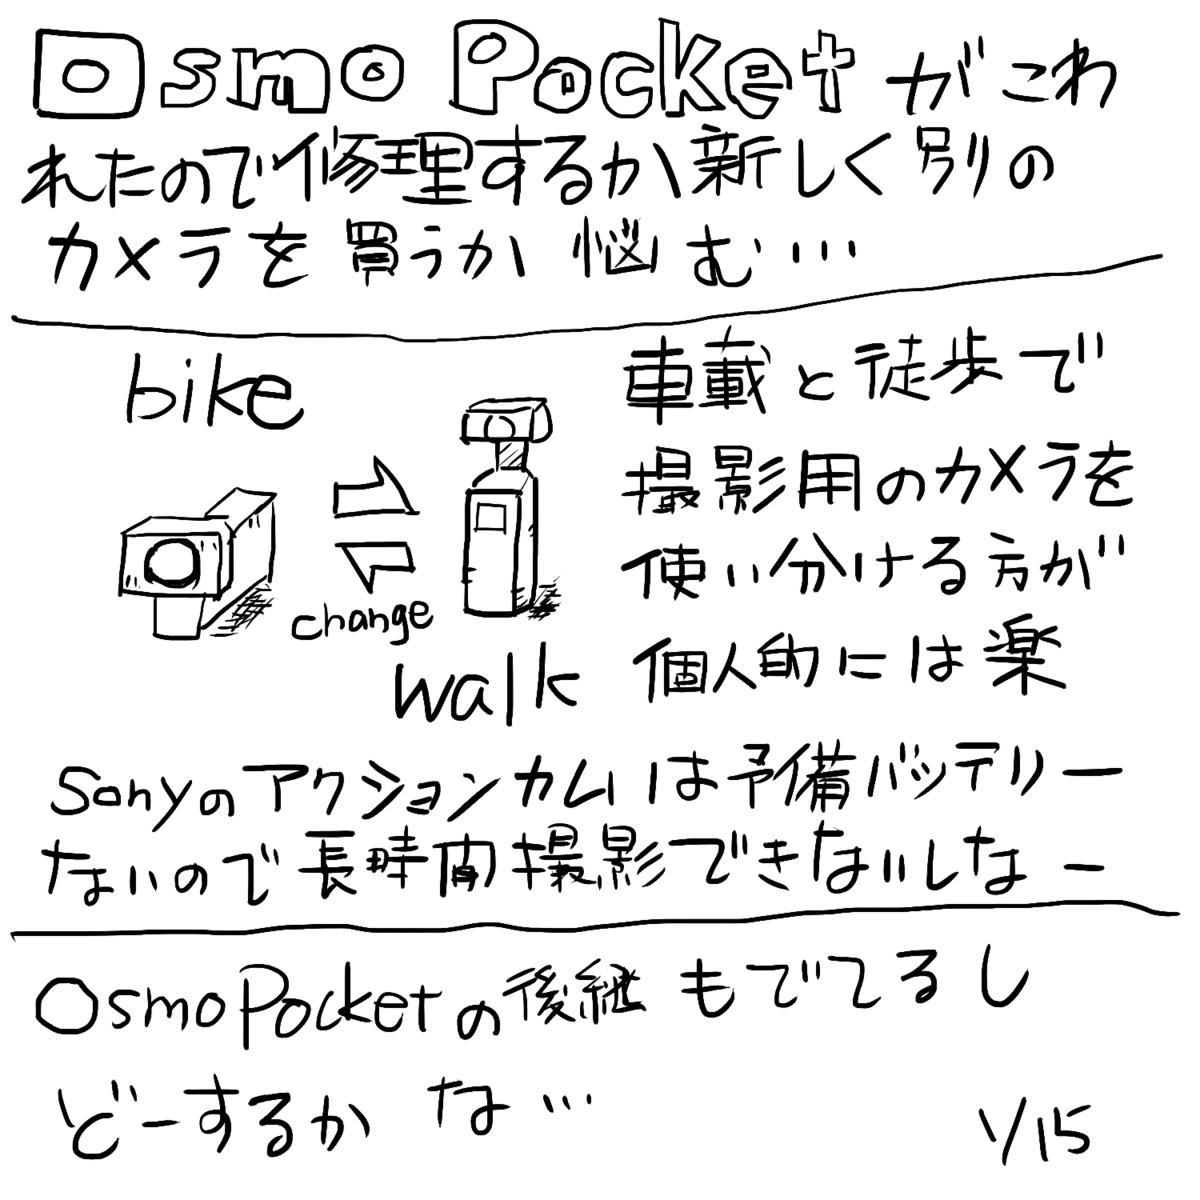 f:id:zomuzomu:20210115121113p:plain